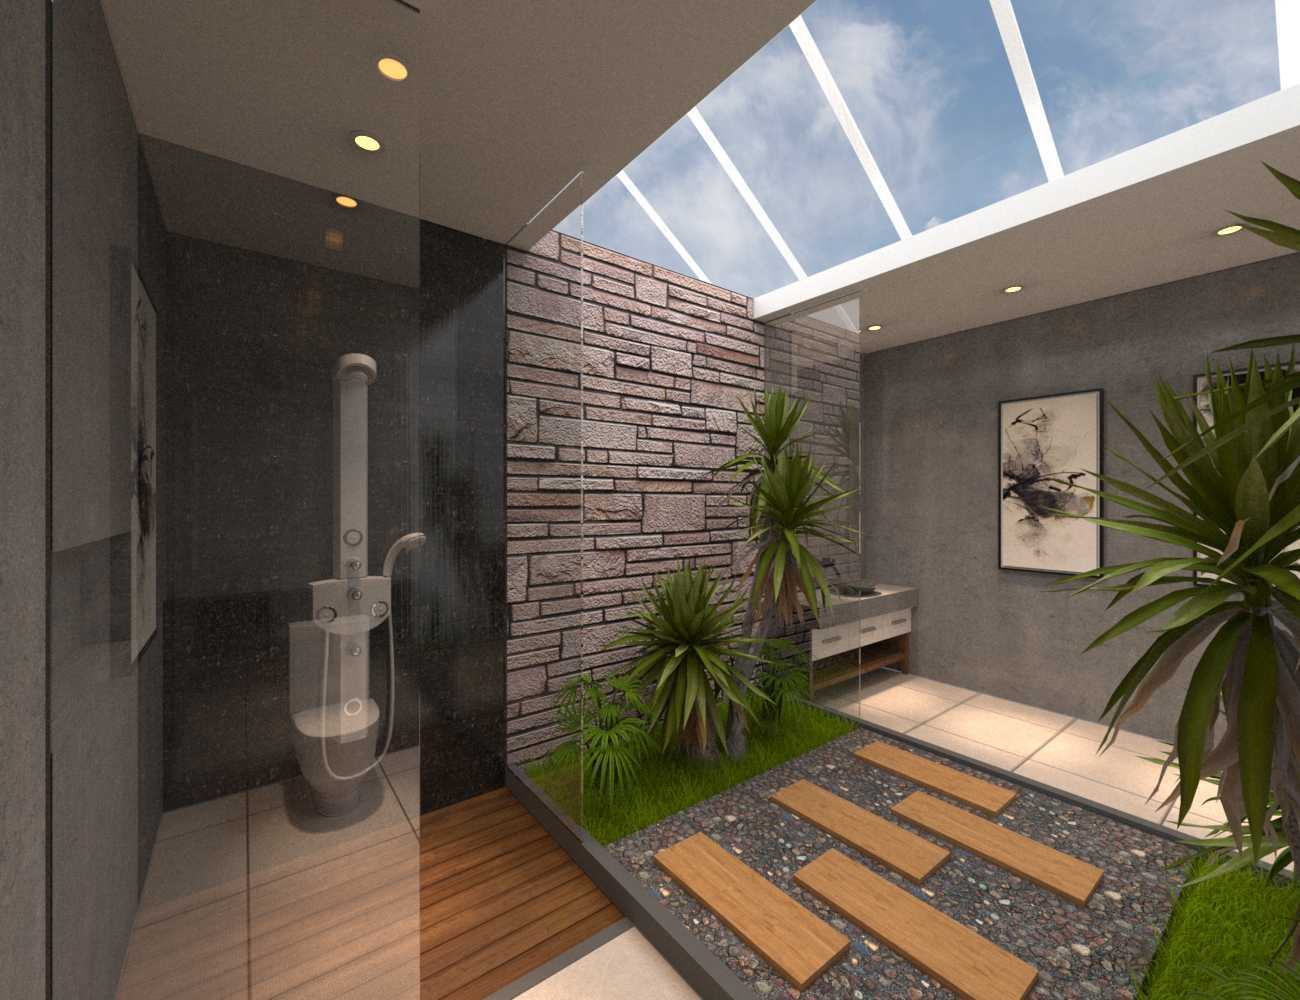 Sense Studio Villa - Bpk Rudy Bali, Indonesia Bali, Indonesia Sense-Studio-Villa-Bpk-Rudy Kontemporer  51640